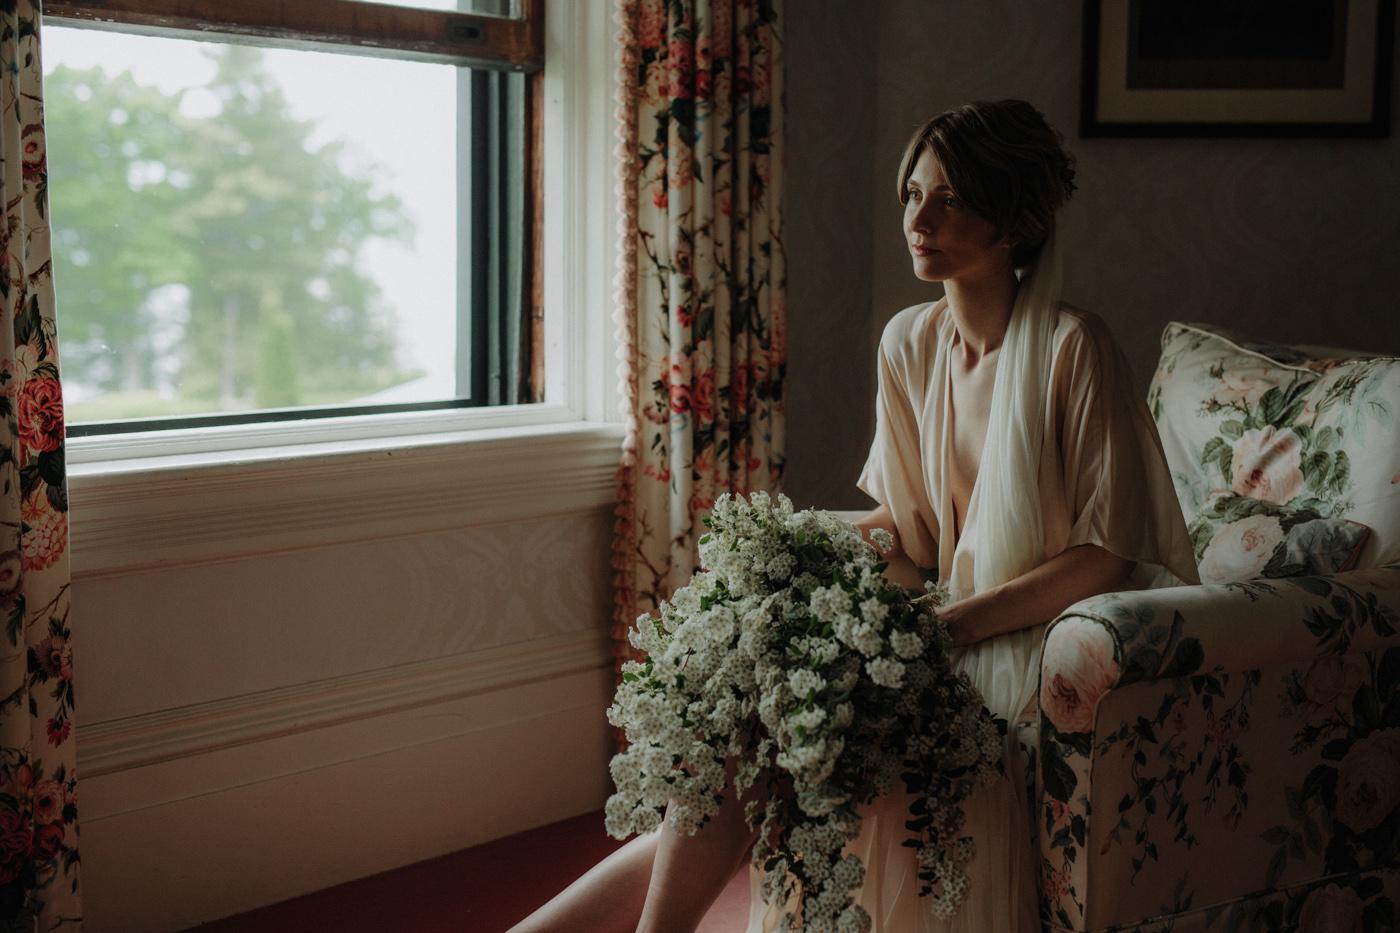 Erin-Mike-Intimate-Vintage-Wedding-Shelburne-Farms-Vermont -59.jpg